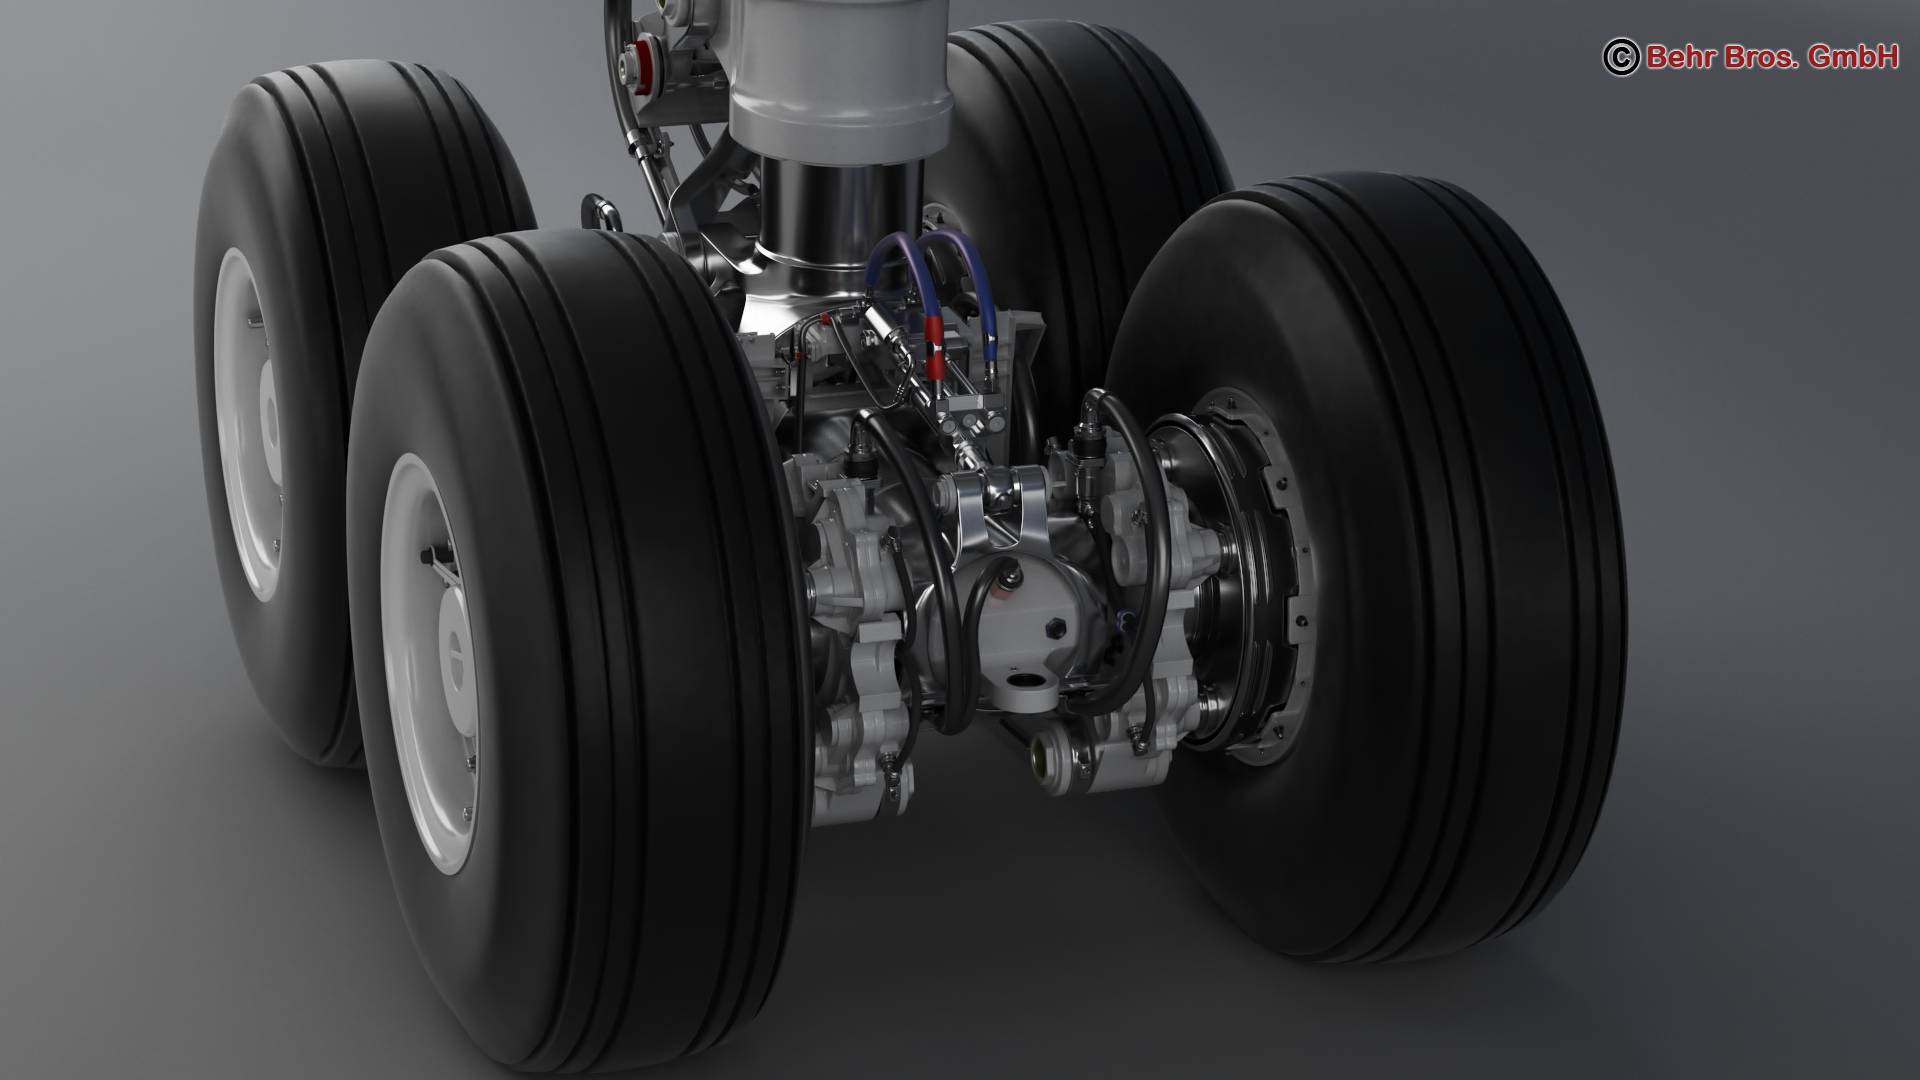 boeing 787-8 3d model 3ds max fbx c4d lwo ma mb obj 251349